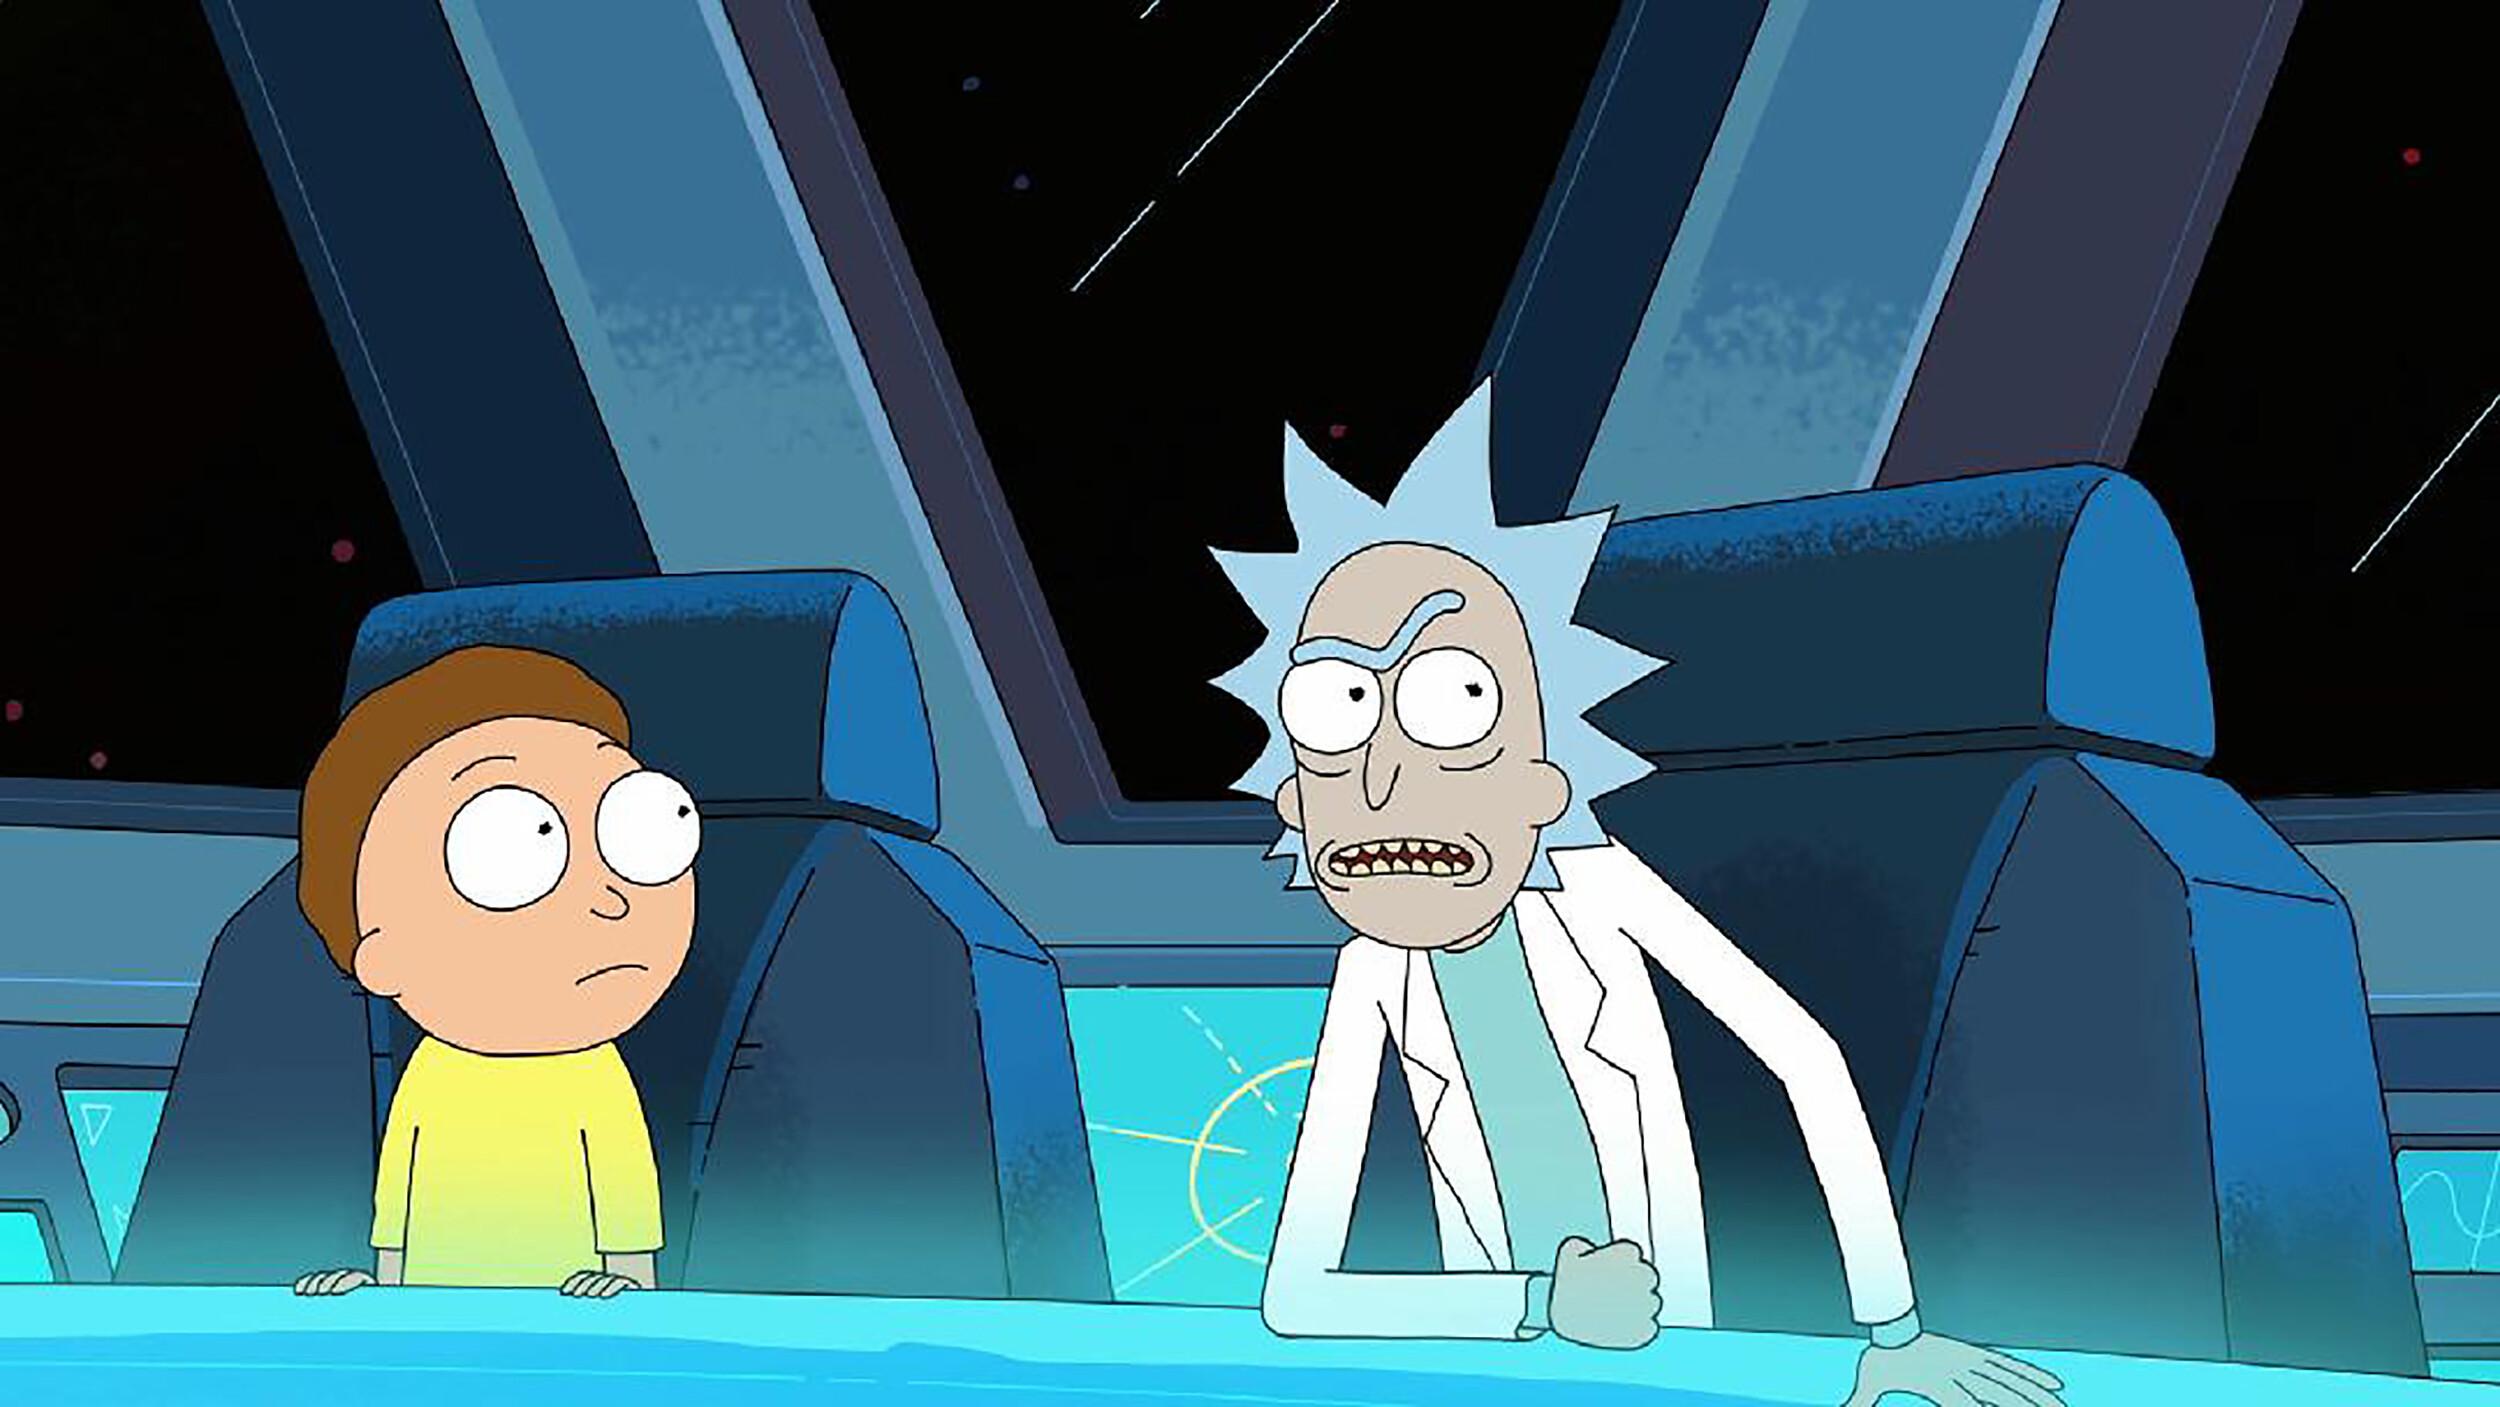 'Rick and Morty' season 5 finale brings back a fan favorite